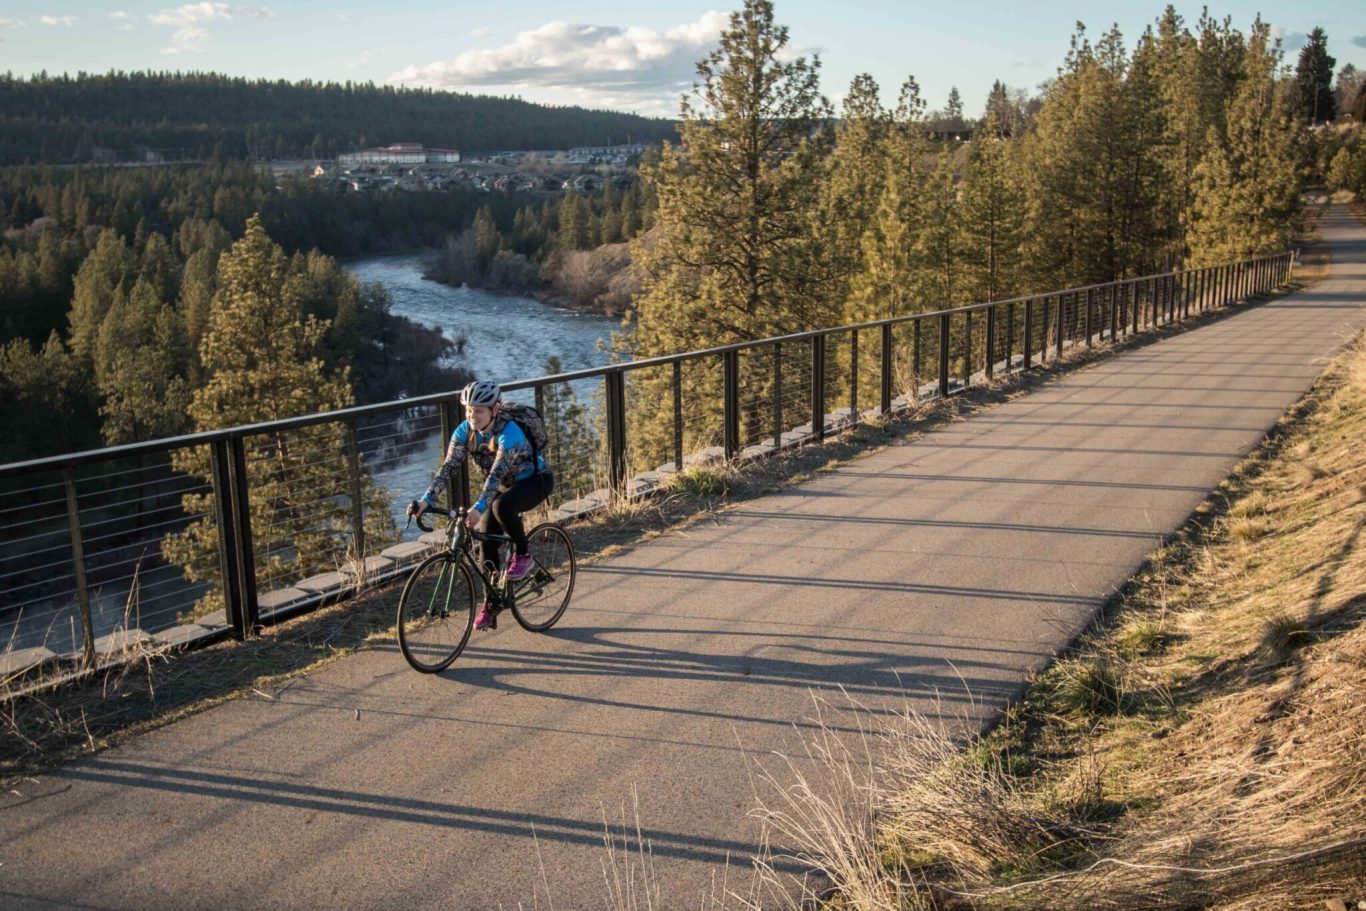 Person biking on the Centennial Trail that runs alongside the Spokane River.